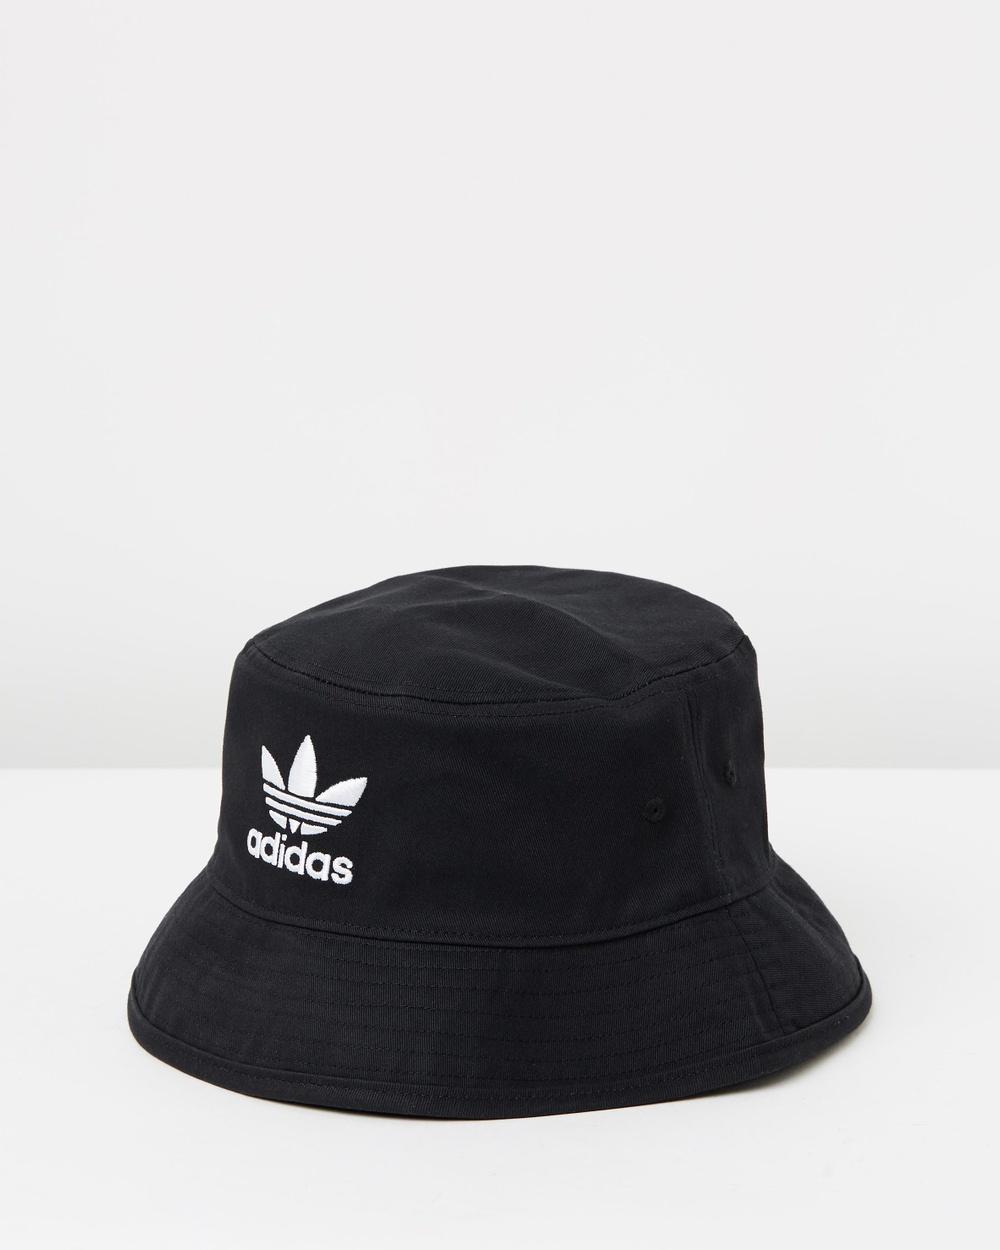 adidas Originals Trefoil Adicolour Bucket Hat Hats Black